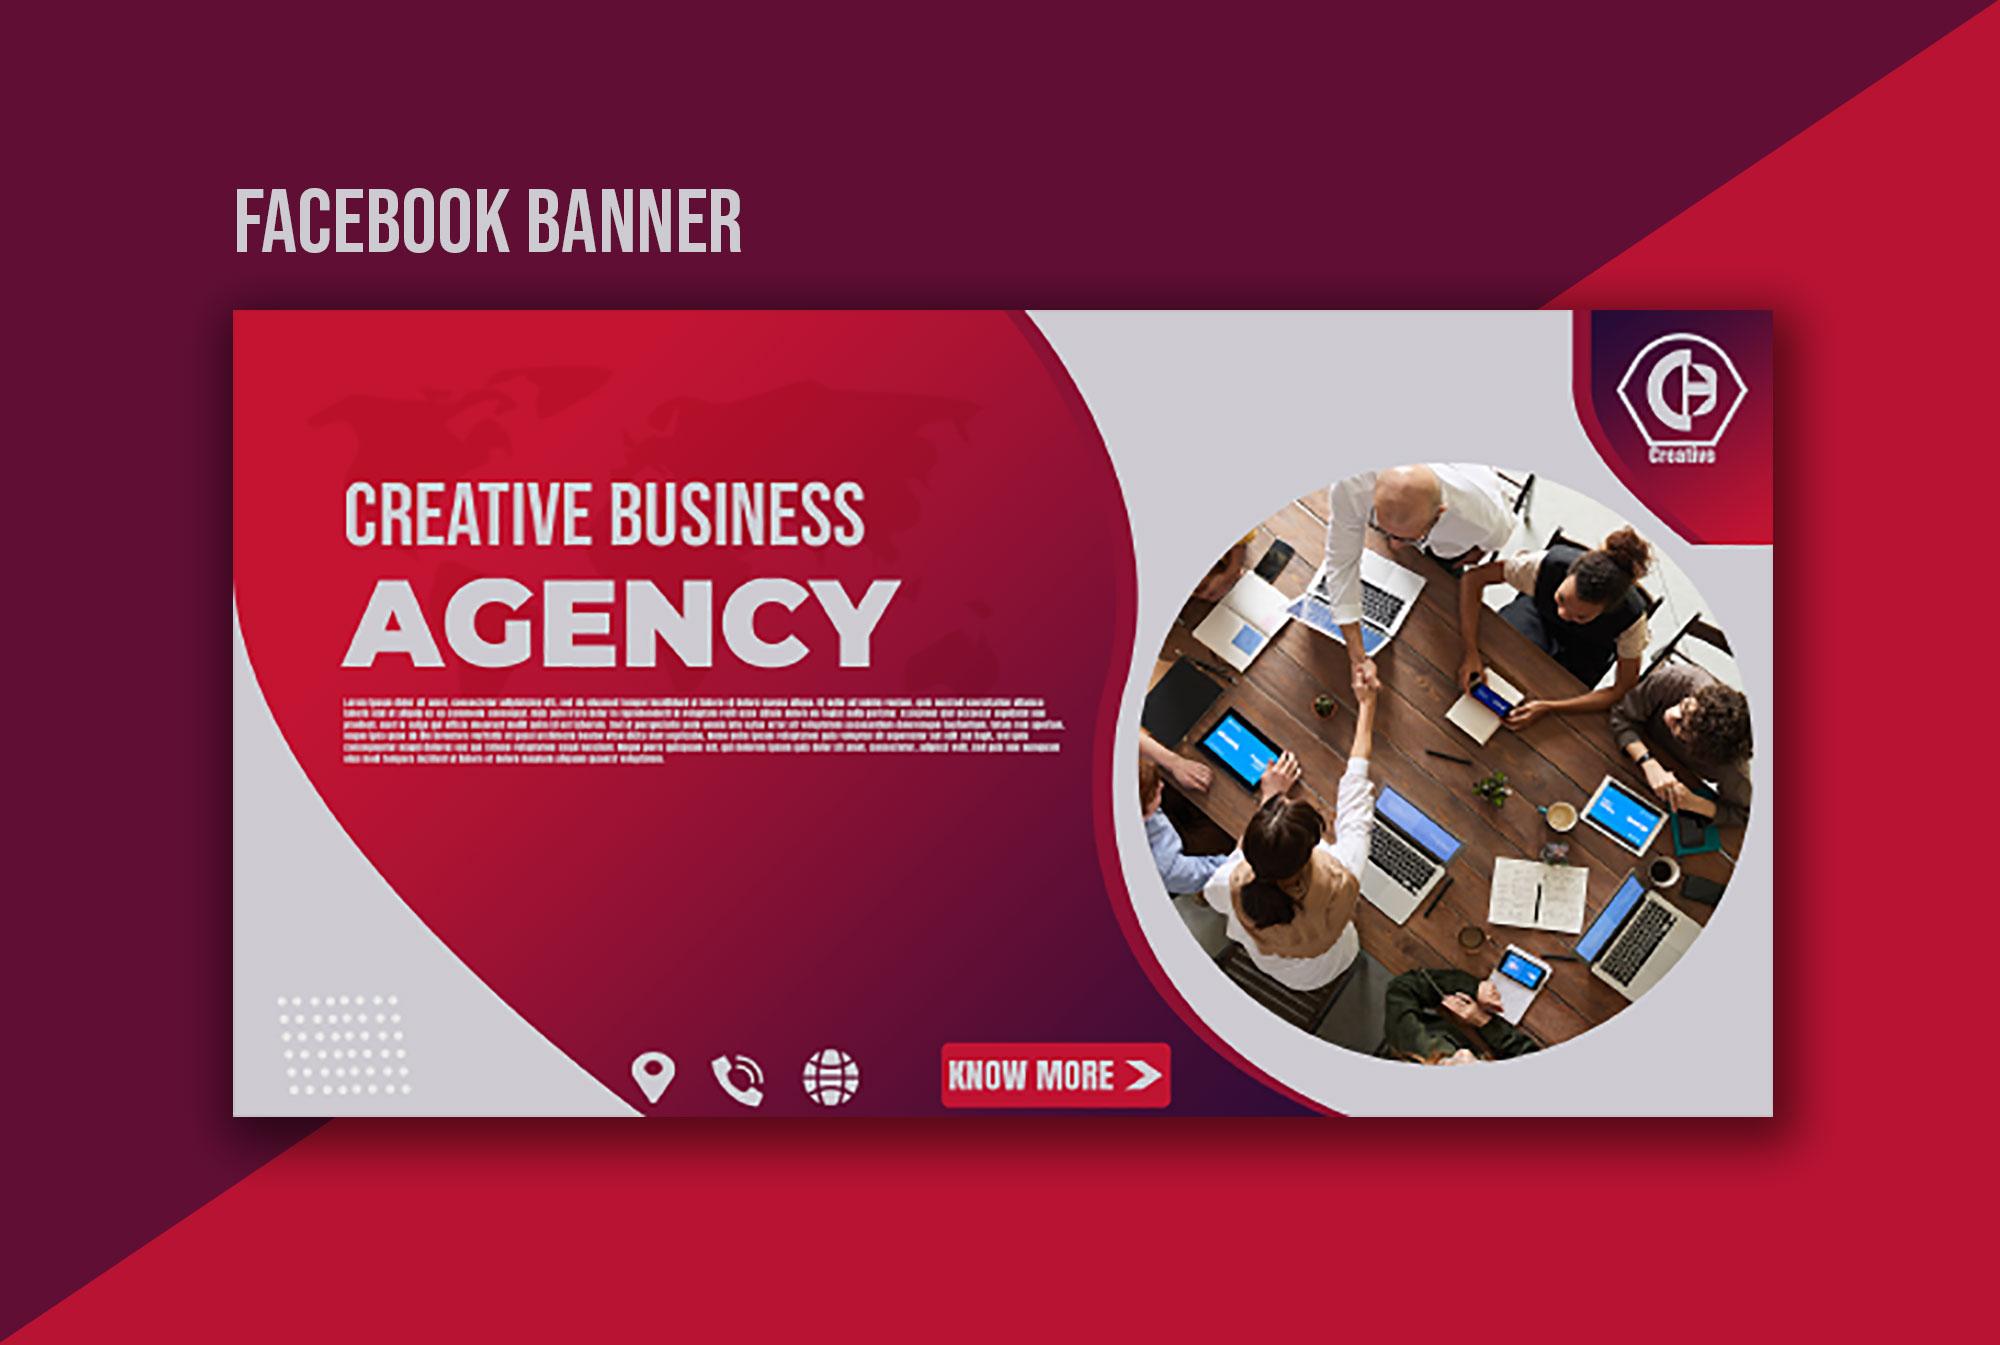 I will design a professional facebook cover